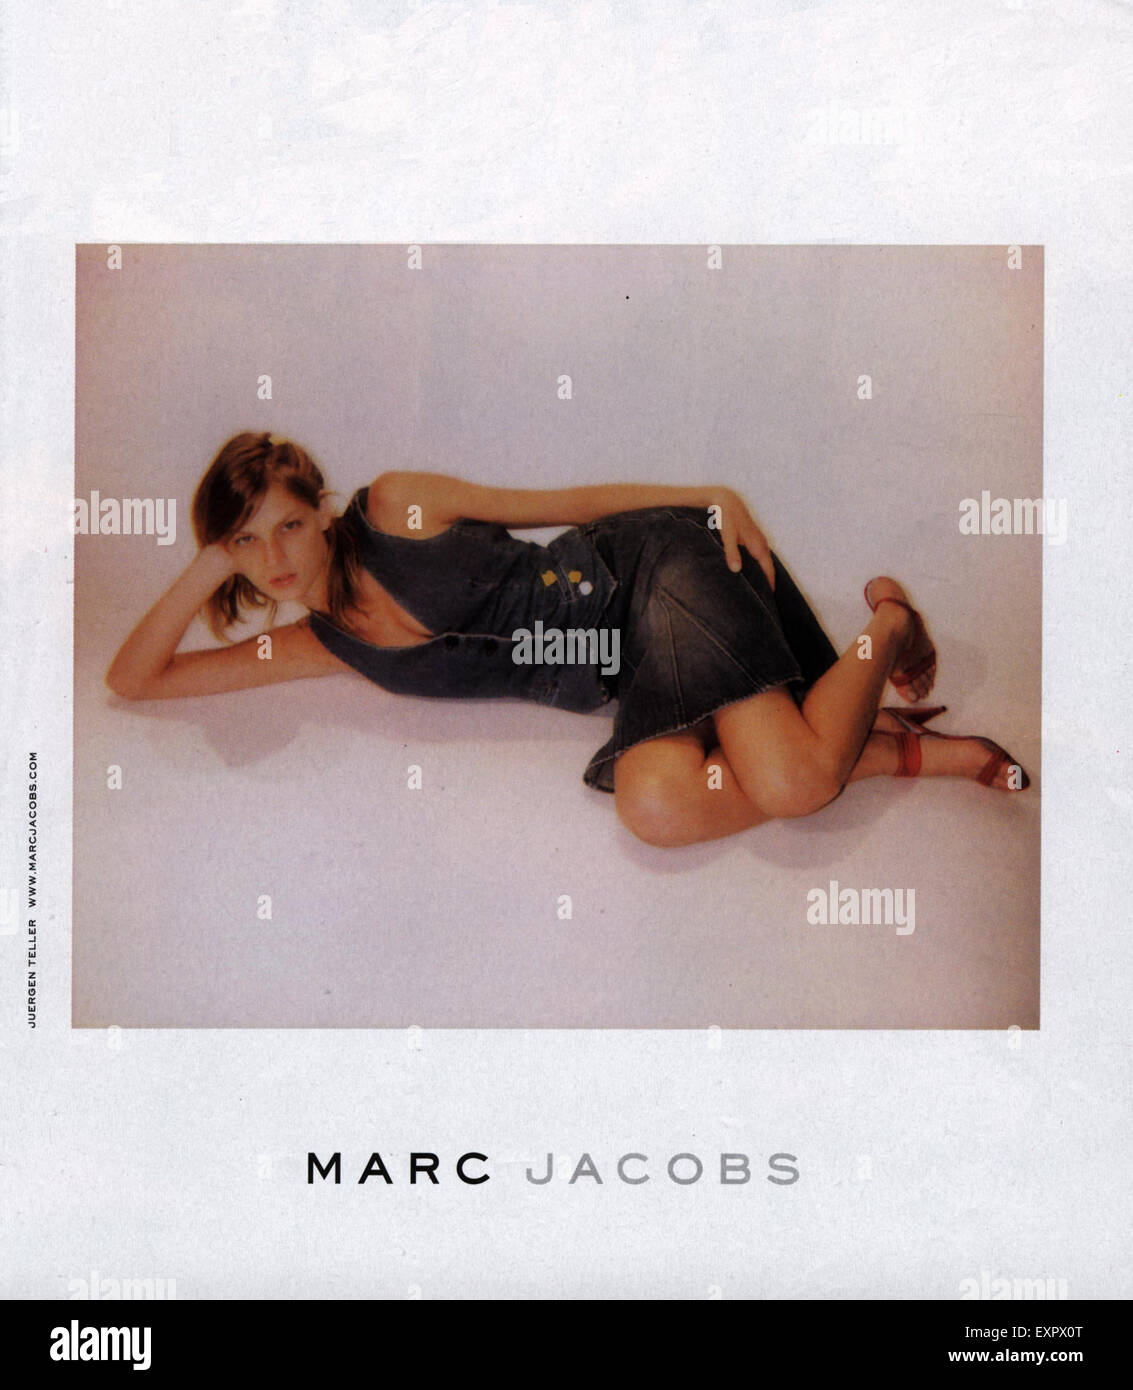 2000S UK Marc Jacobs Magazine annuncio pubblicitario Immagini Stock